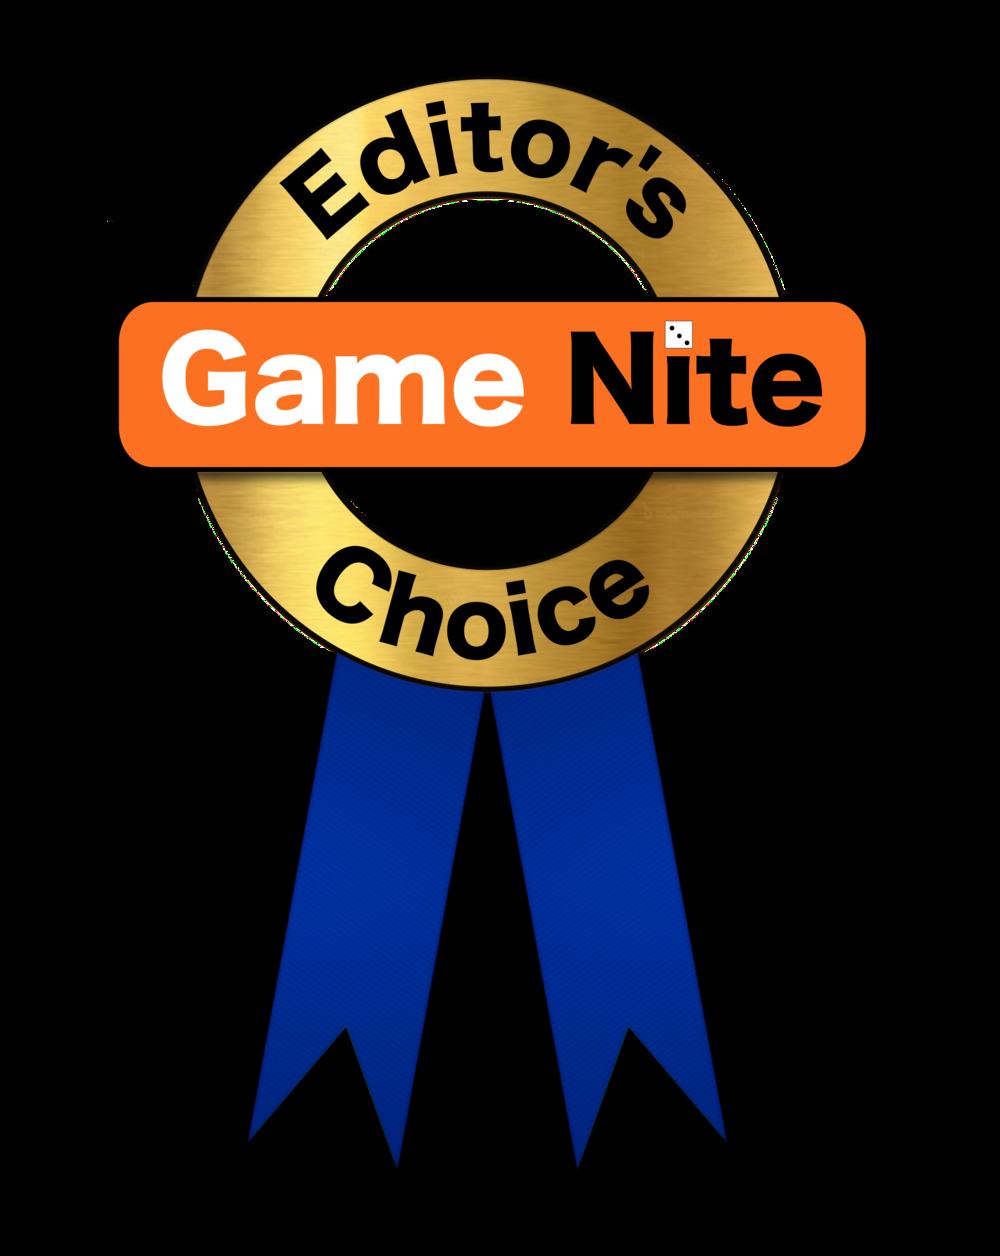 Game Nite Editor's Choice Award.png